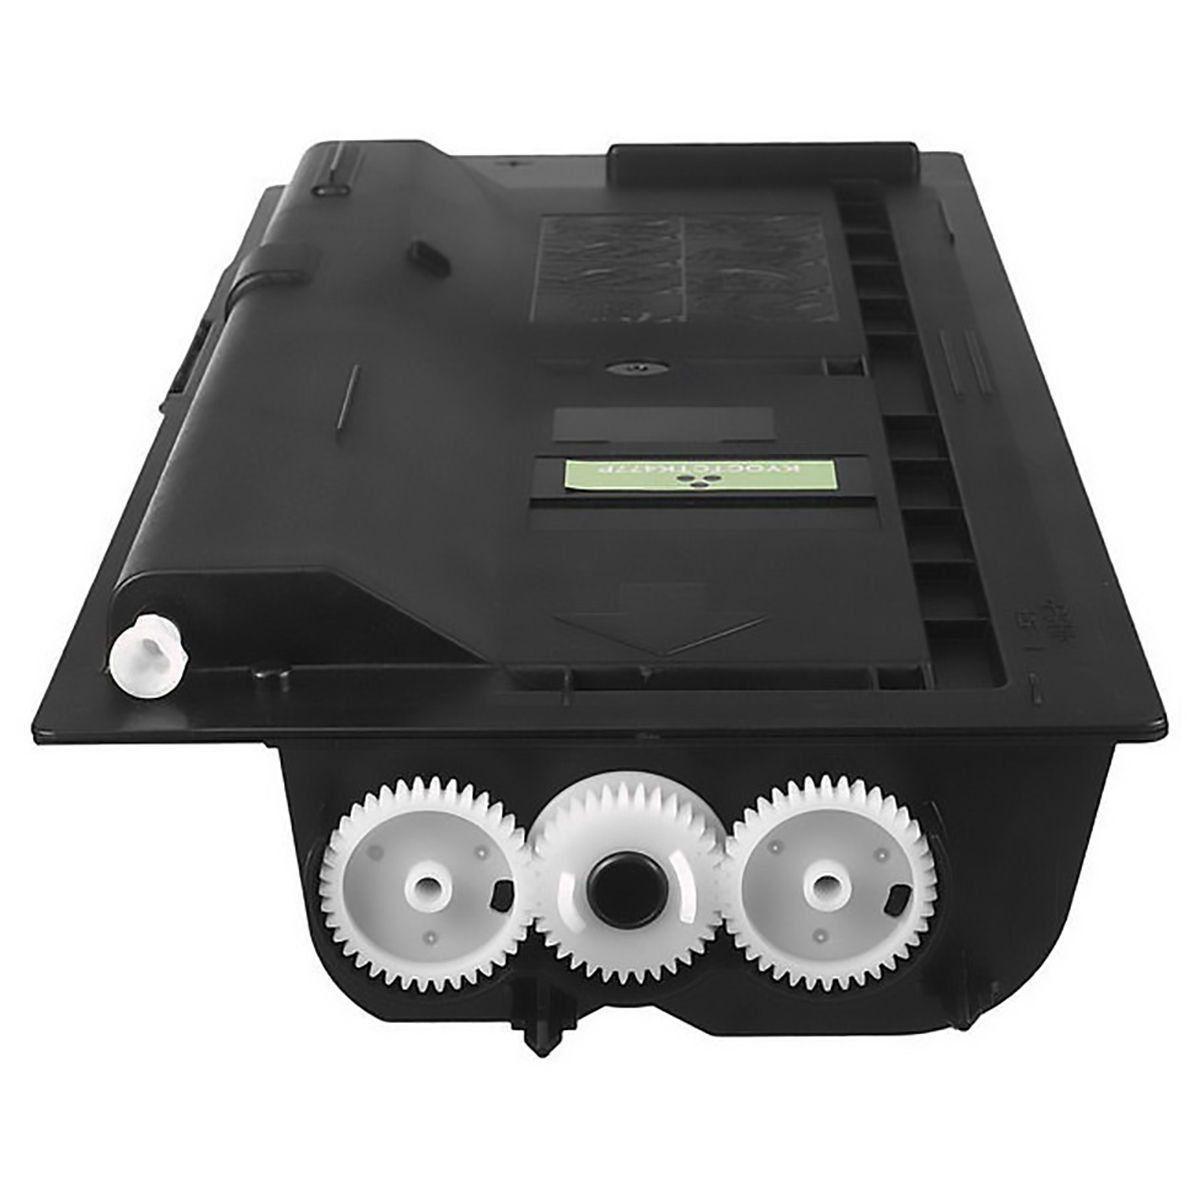 Compatível: Toner TK477 TK-477 para Kyocera Taskalfa-255 Taskalfa-255b TK305 FS-6530mfp FS6525 FS6530 / Preto / 15.000